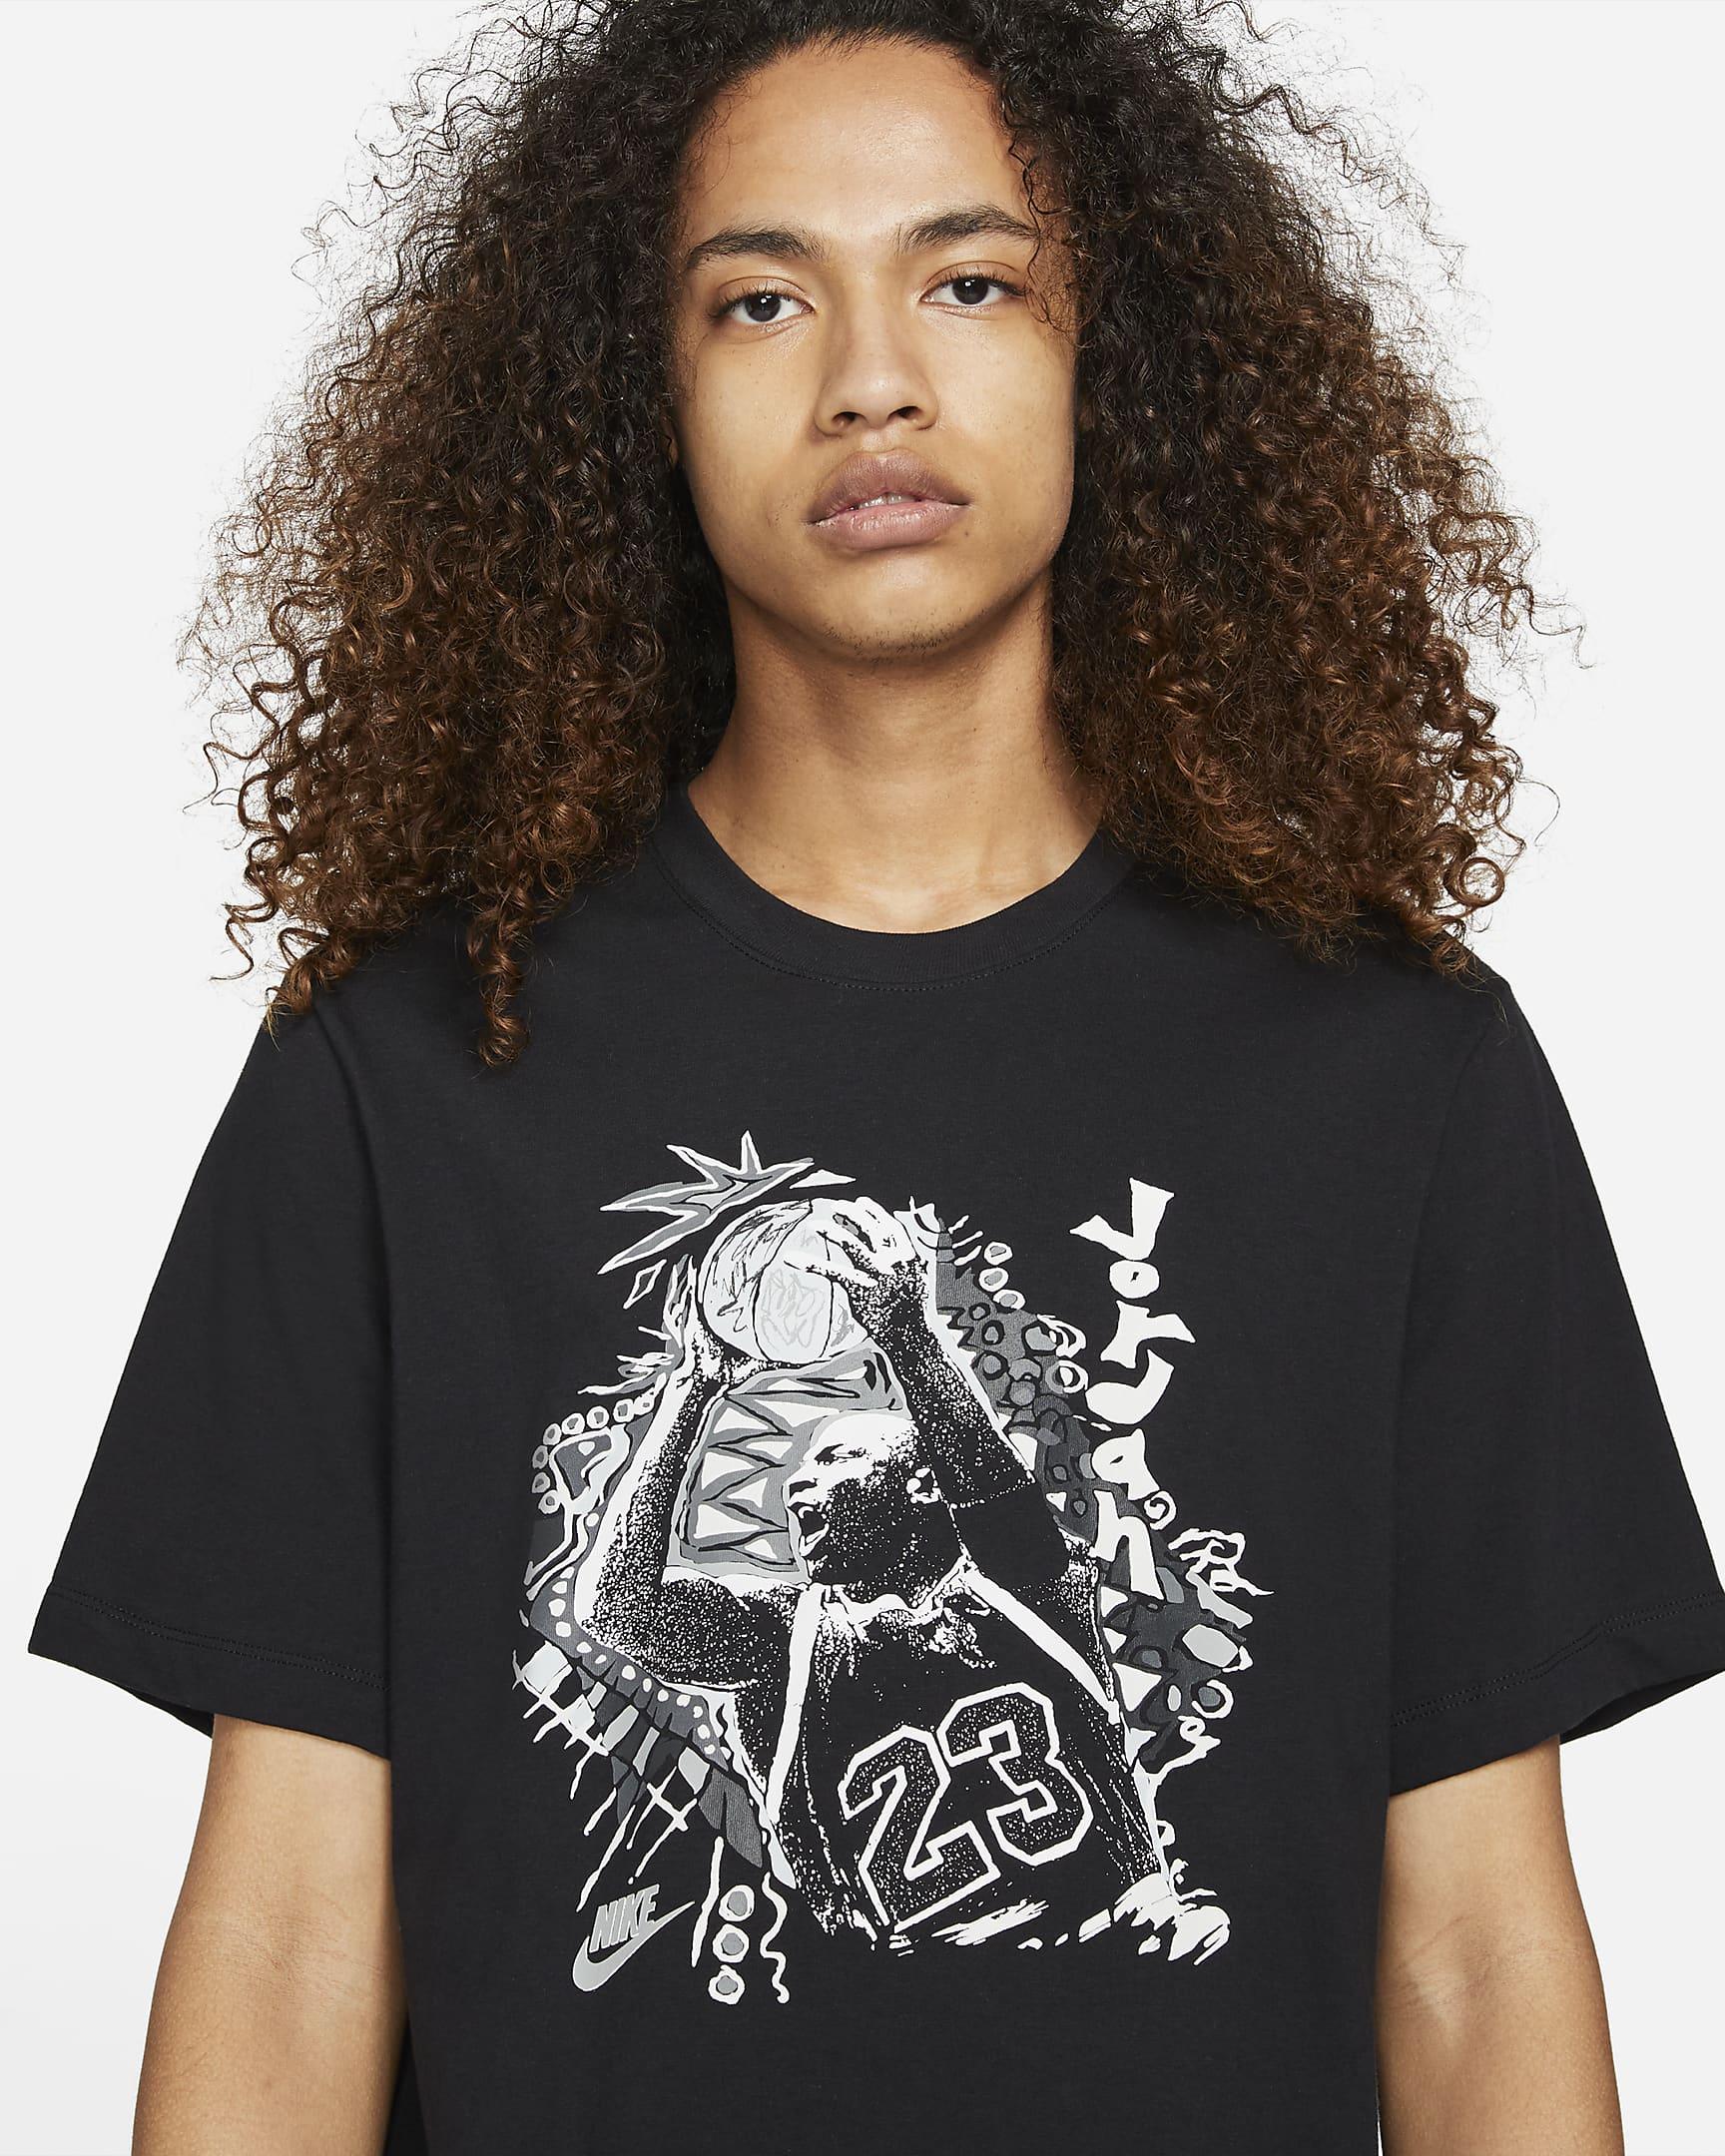 jordan-vintage-mens-graphic-t-shirt-N42Lh8-3.png